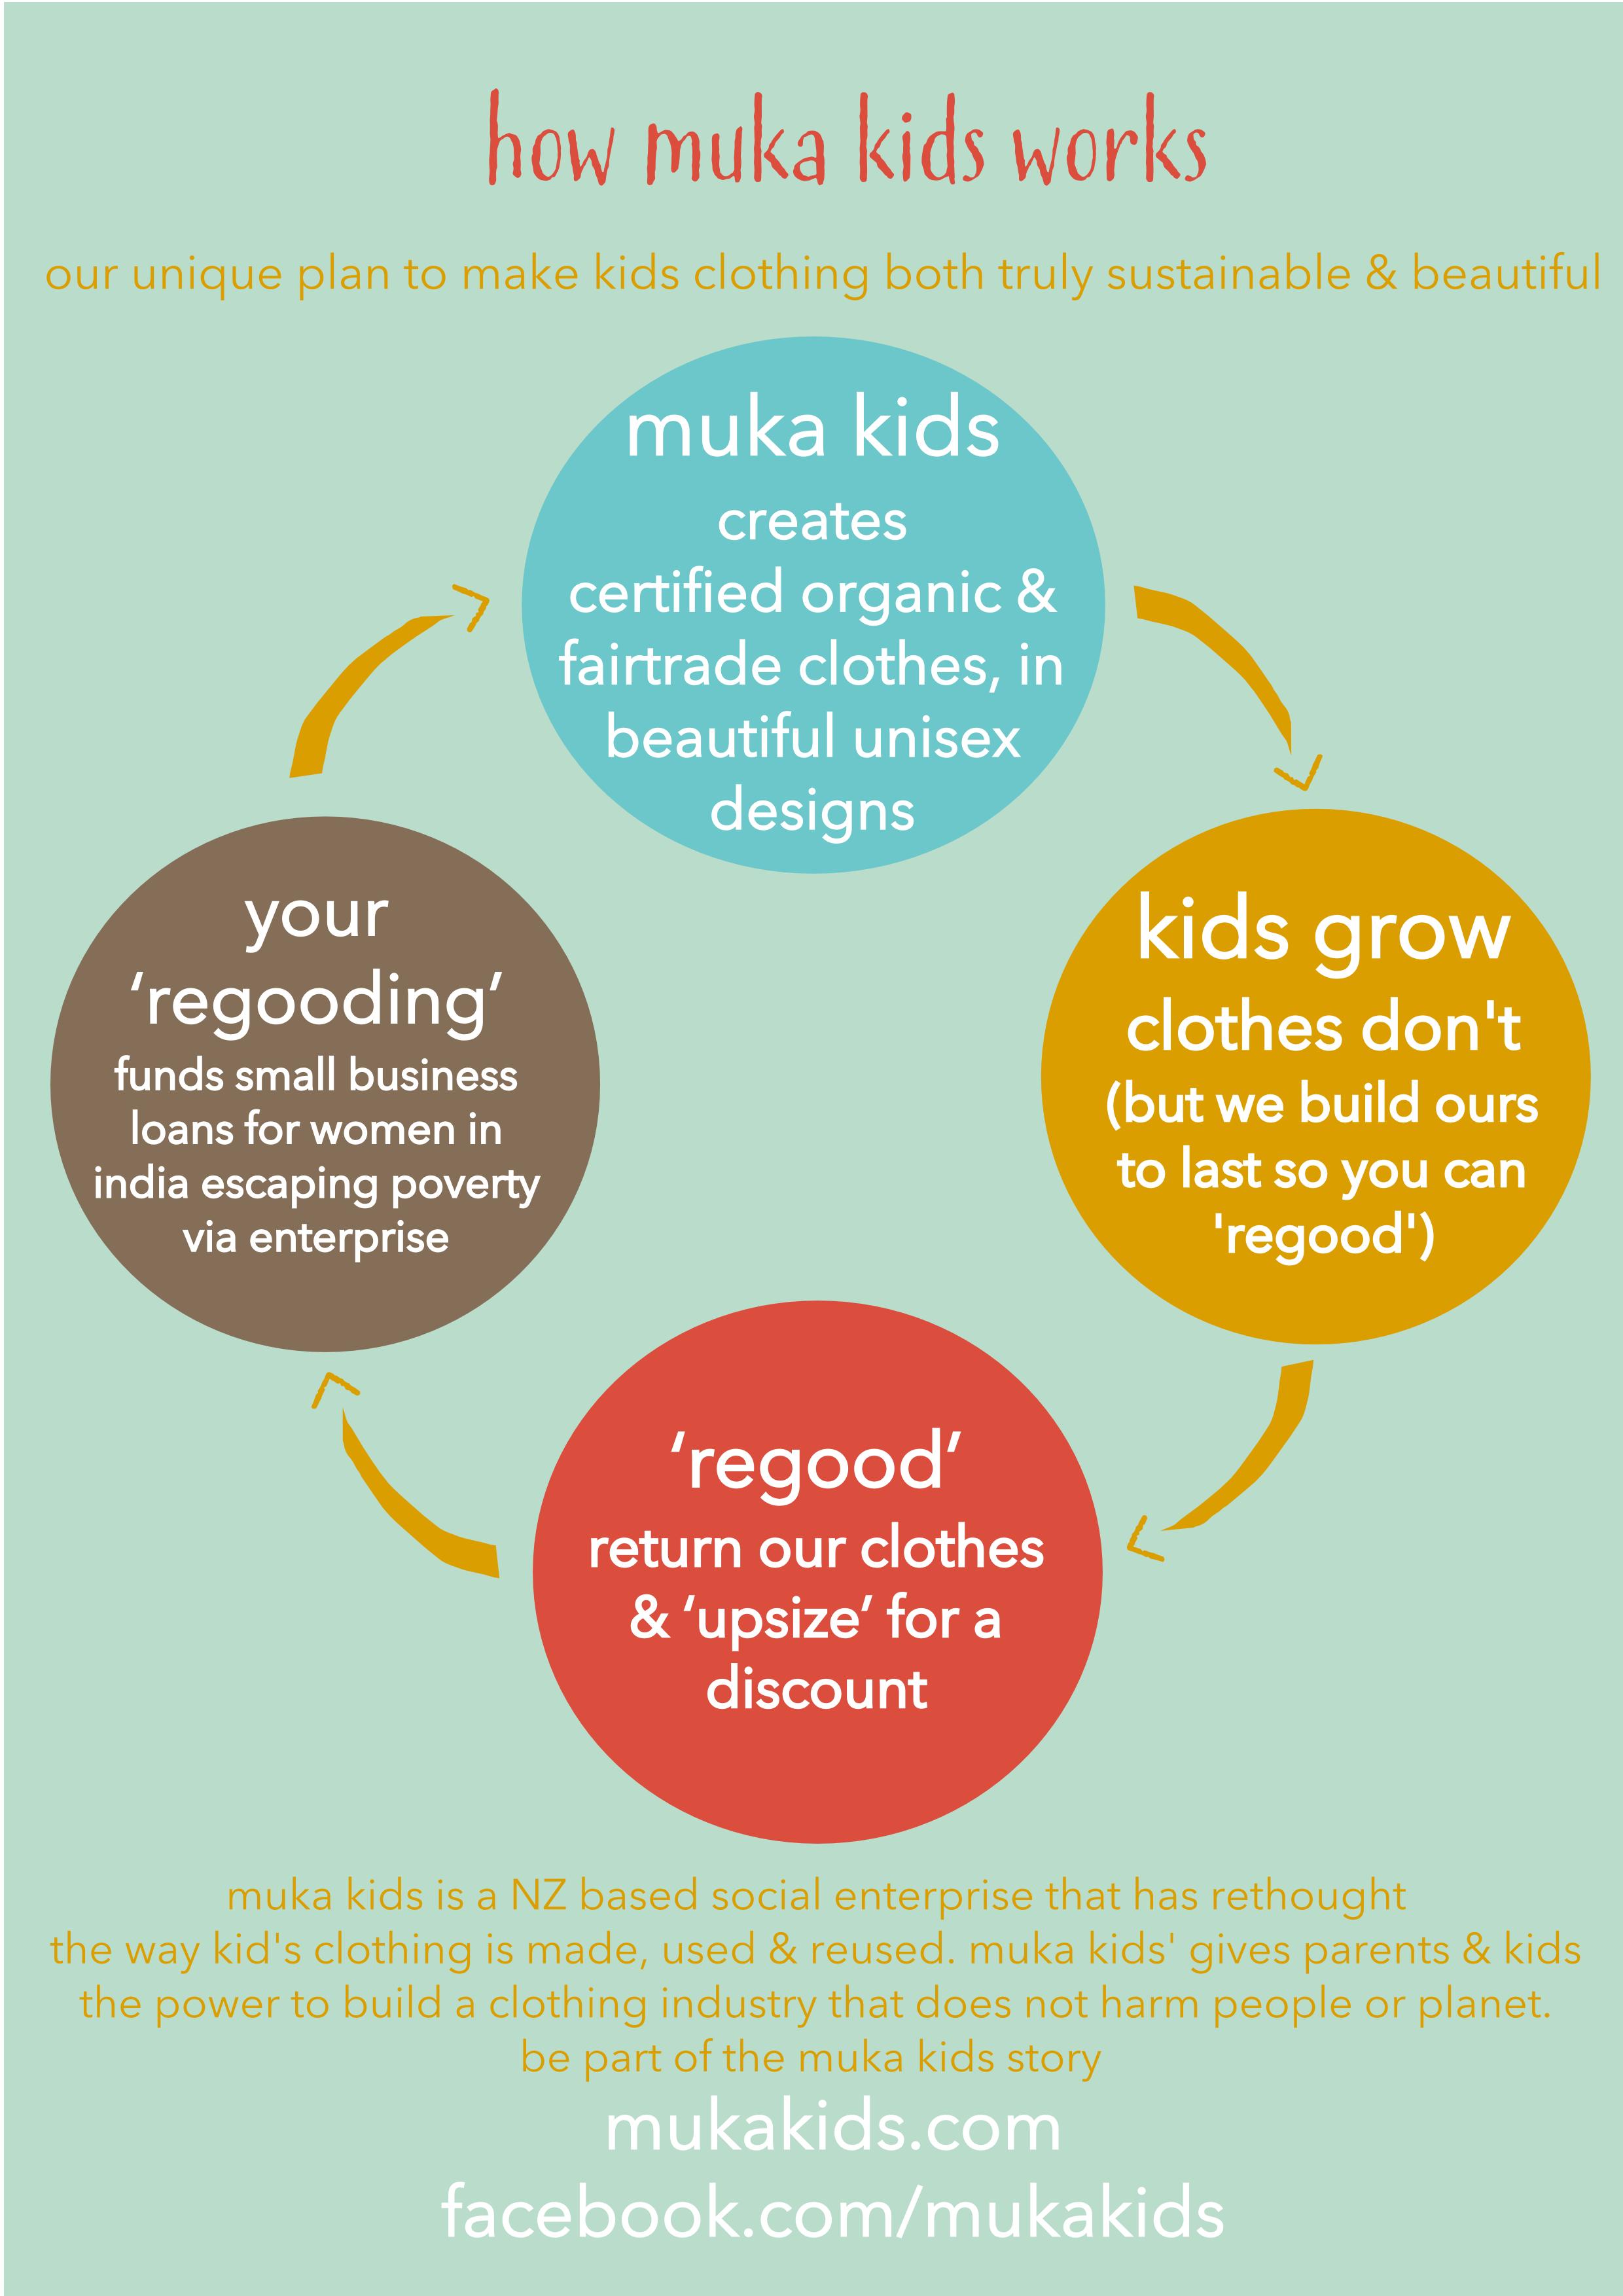 How to revolutionise kids' clothing production | Muka Kids | Sacraparental.com